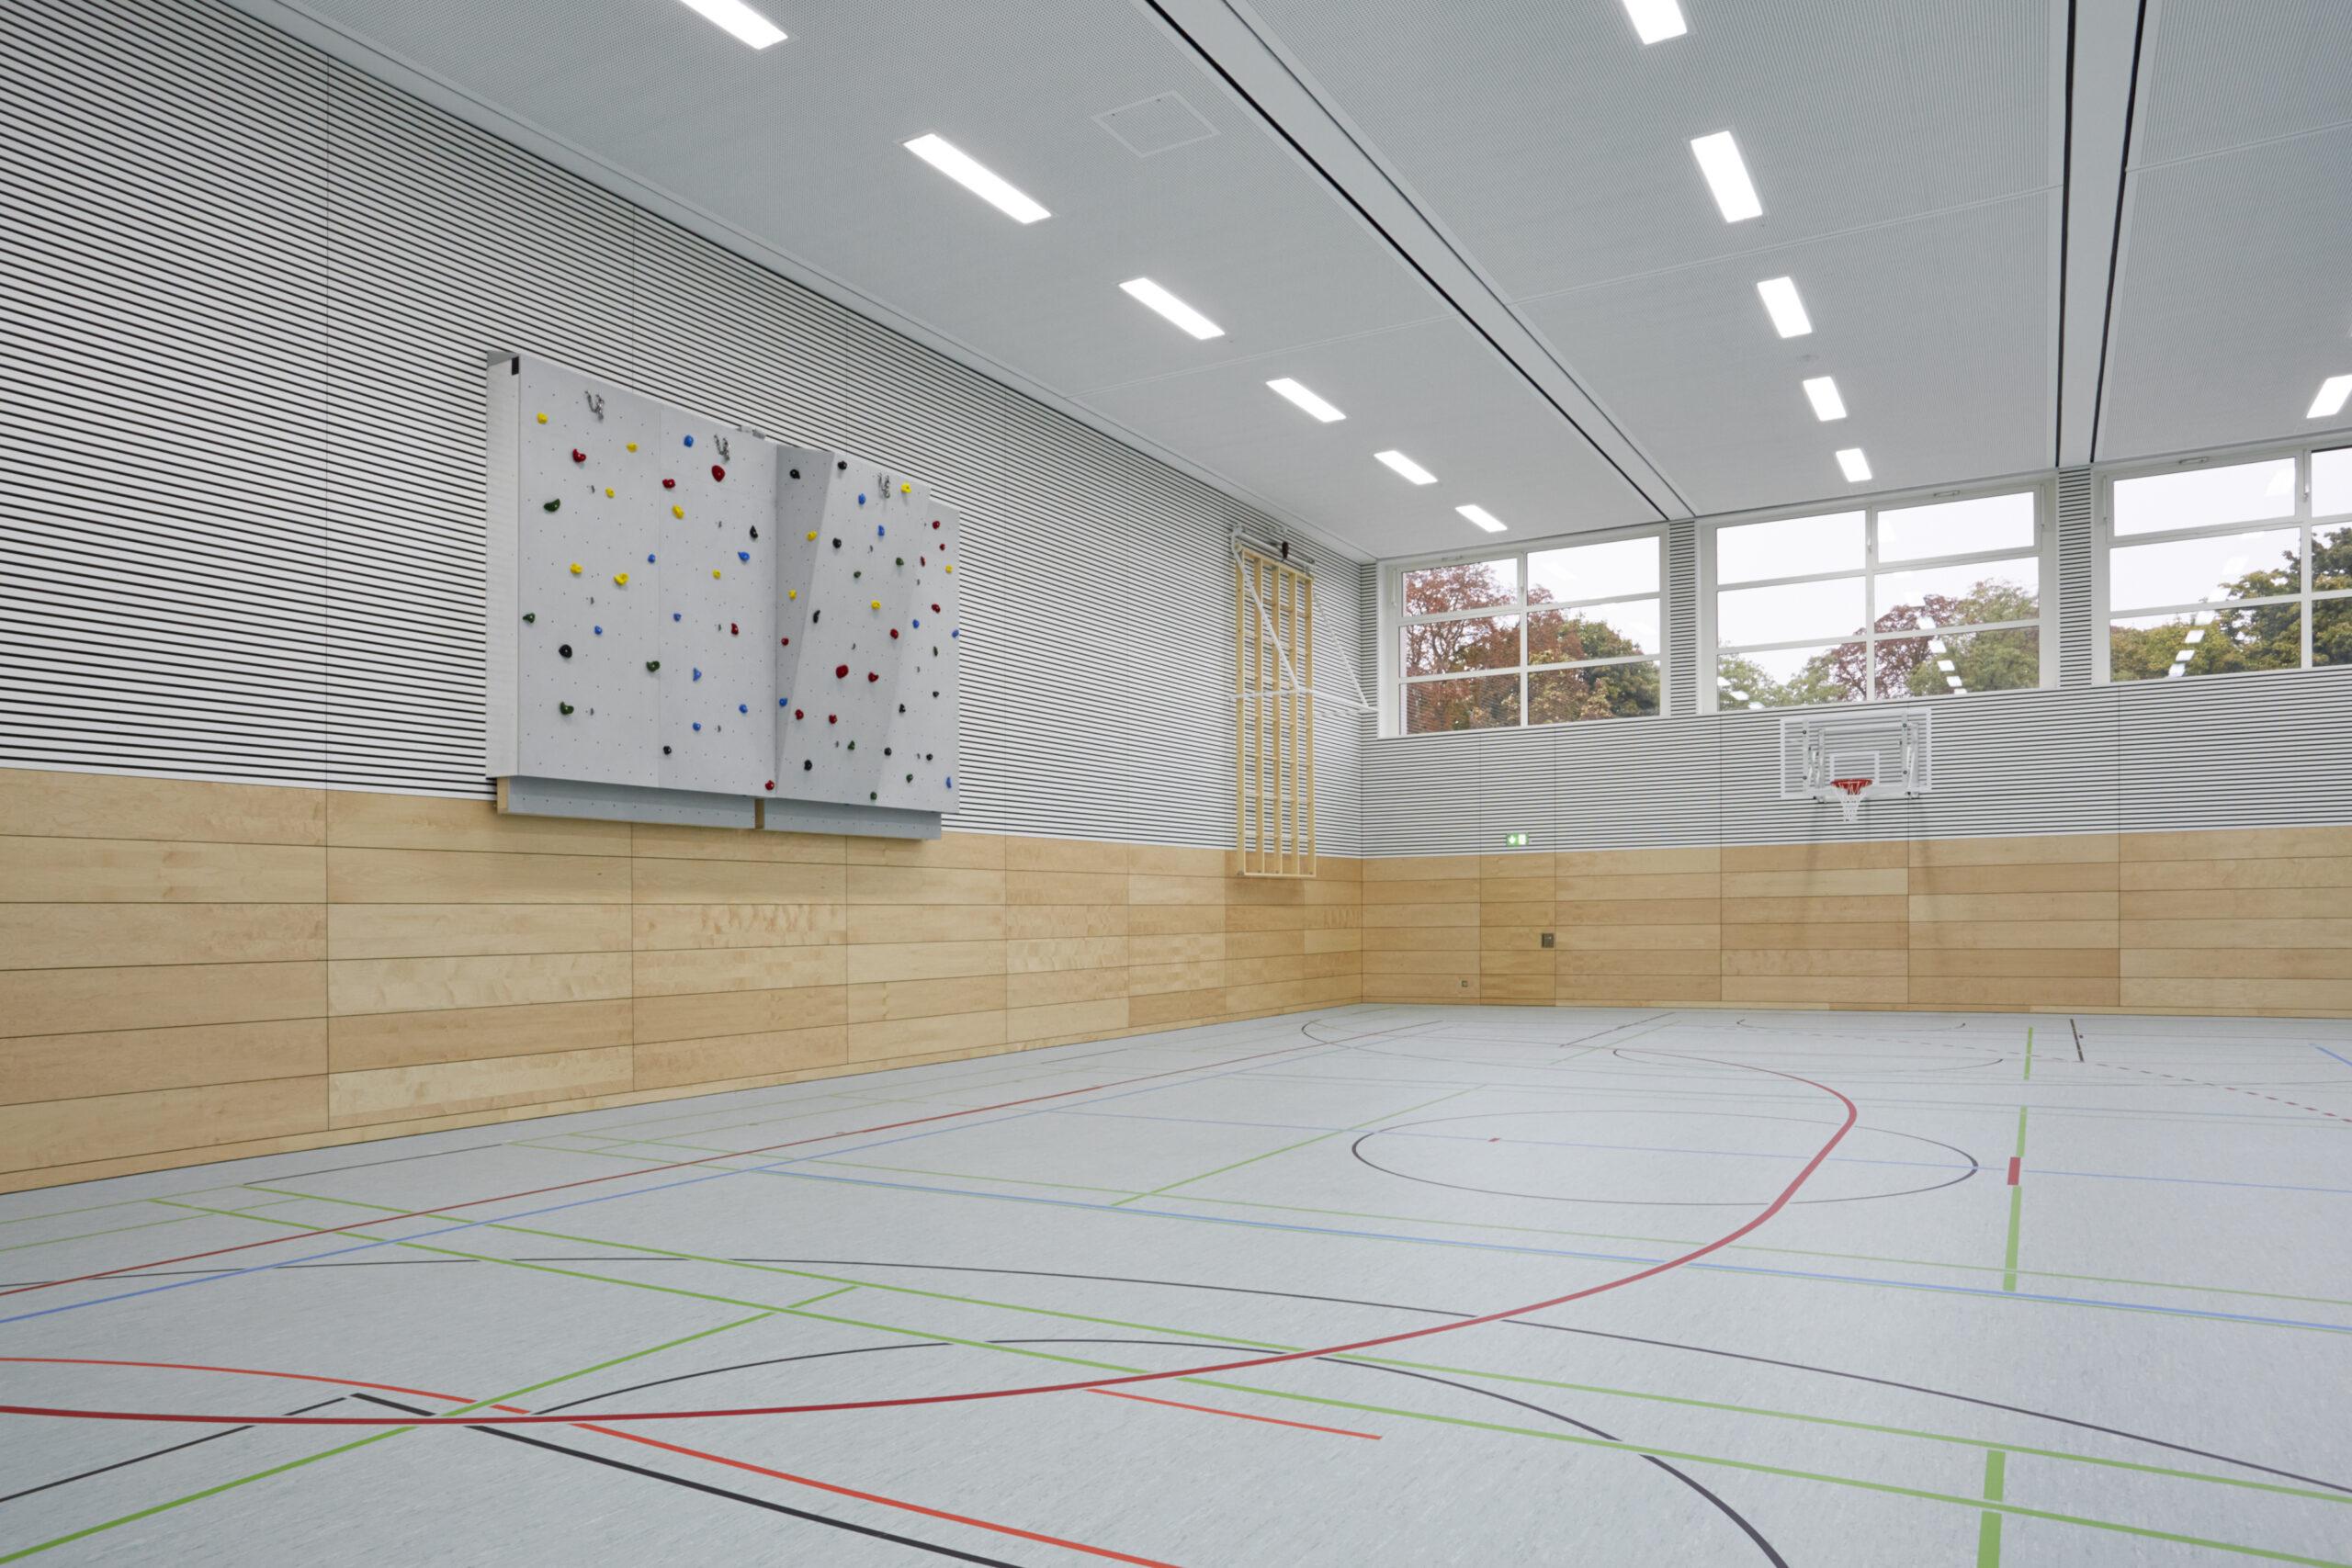 04 Sporthalle